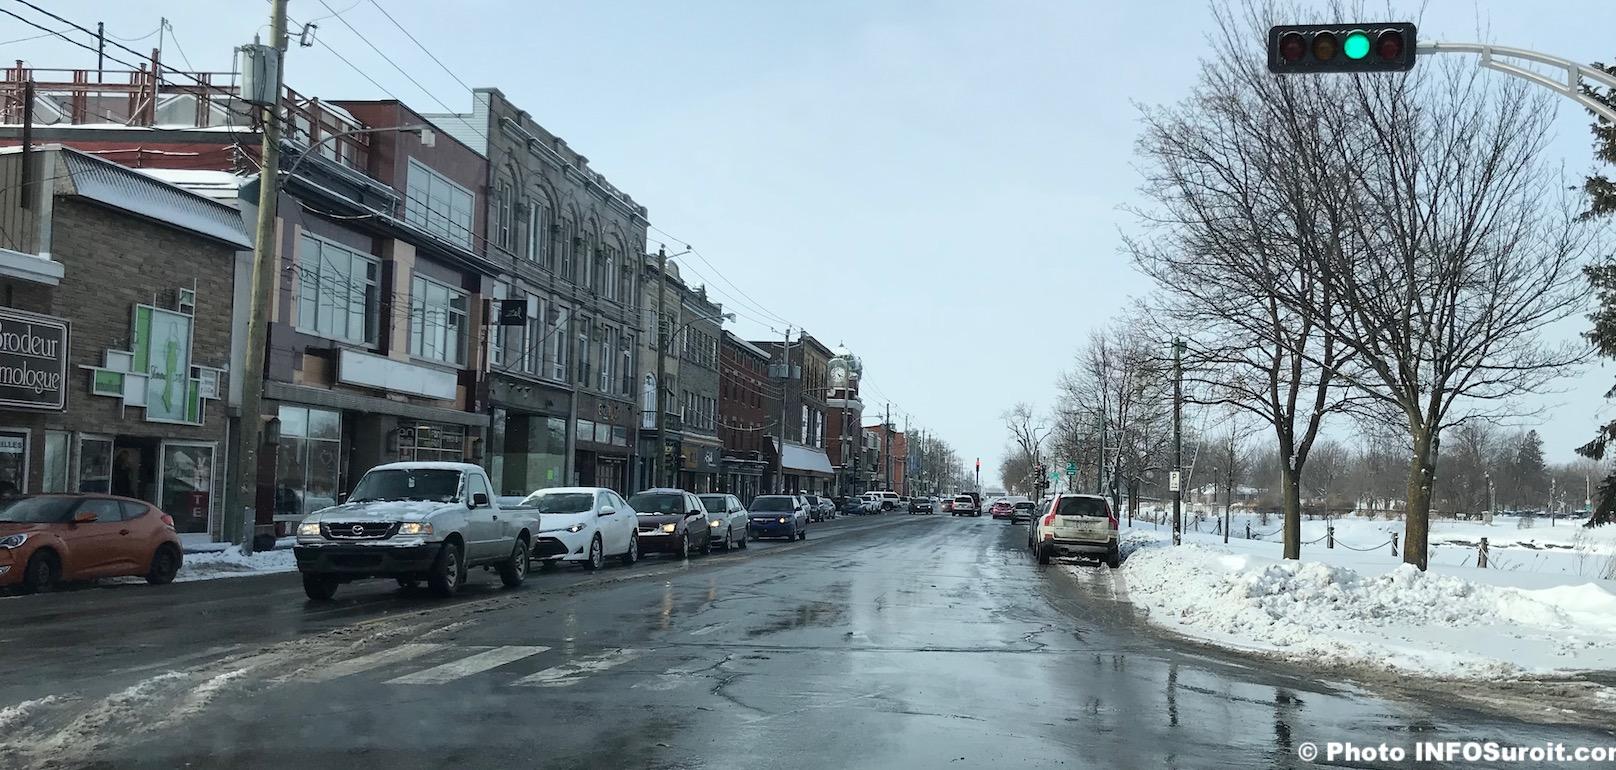 rue Victoria centre-ville Valleyfield hiver commerces photo INFOSuroit